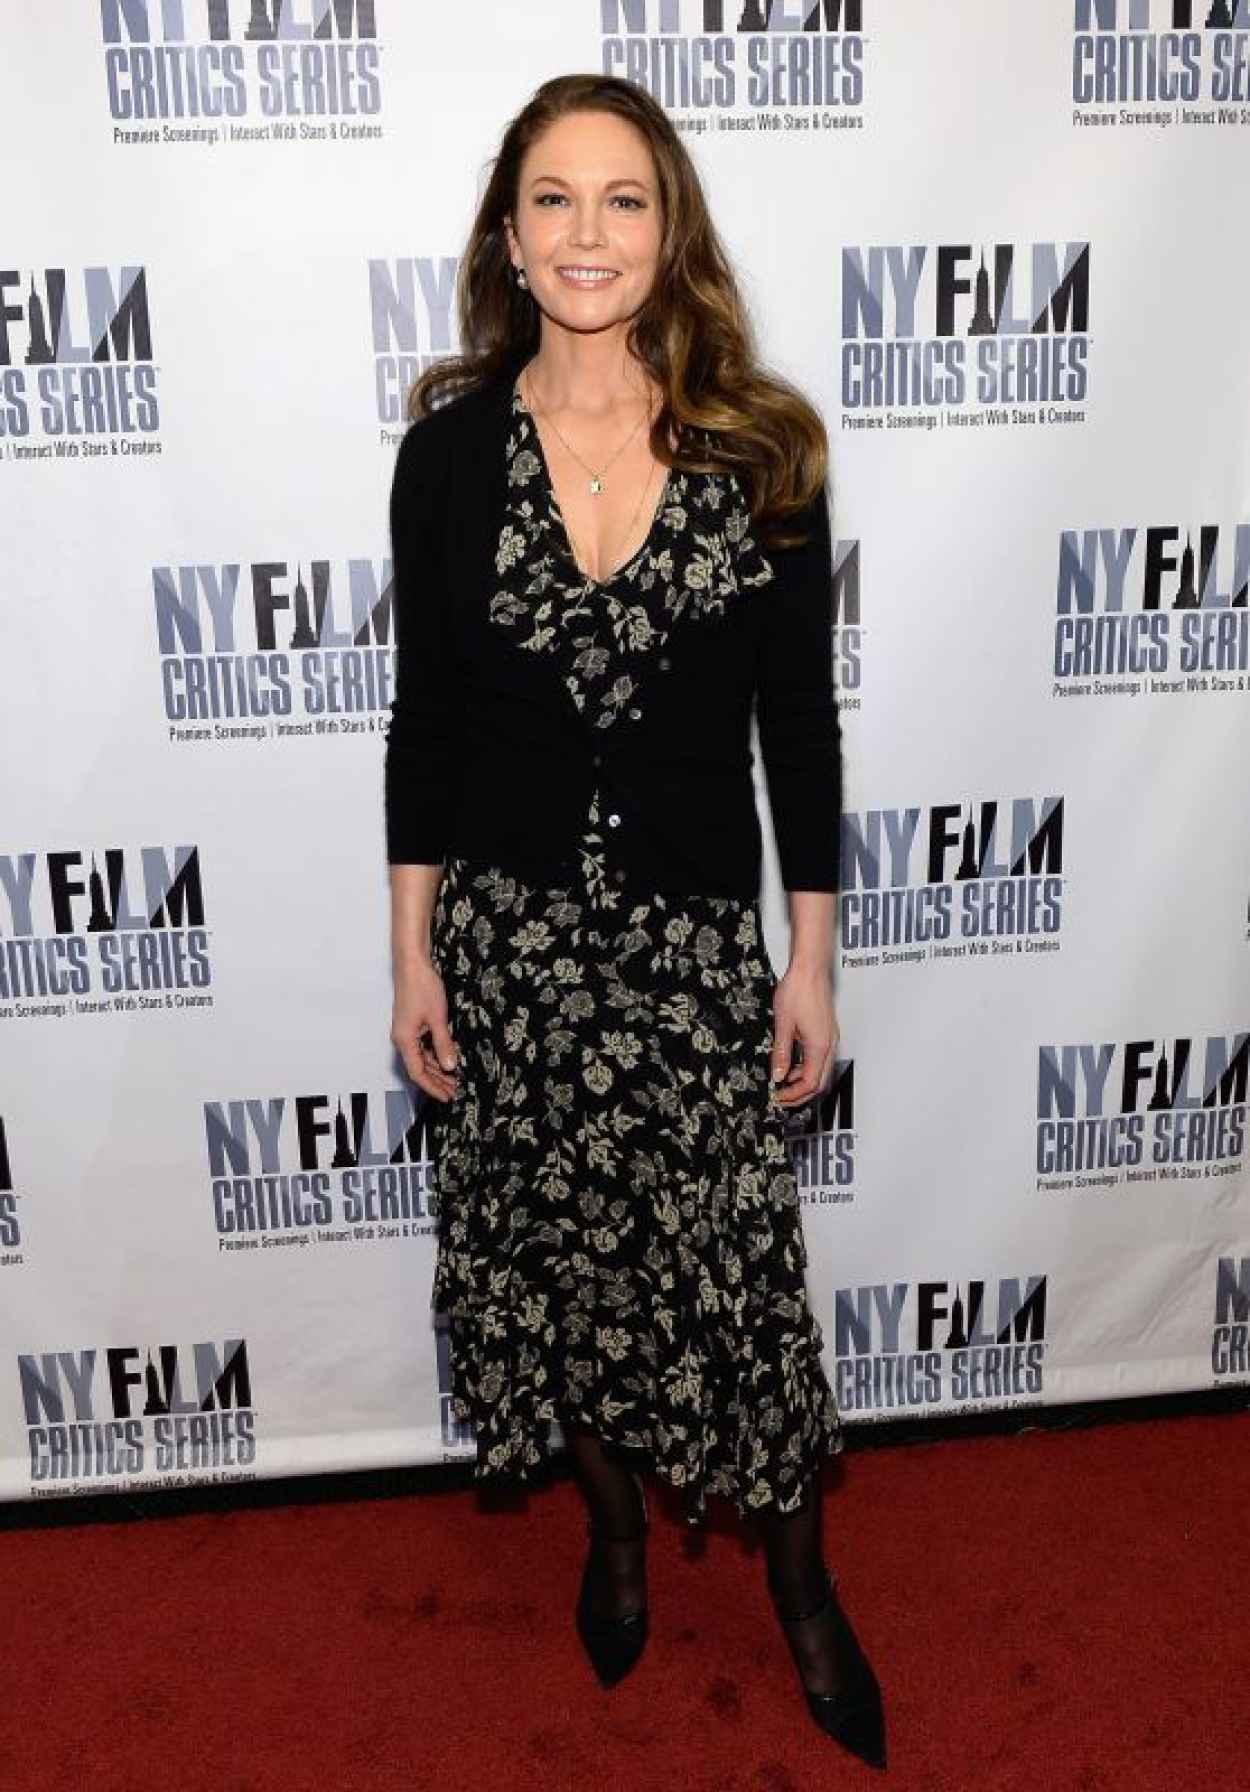 Diane Lane - N.Y. Film Critic Series Premiere of Every Secret Thing in New York-1